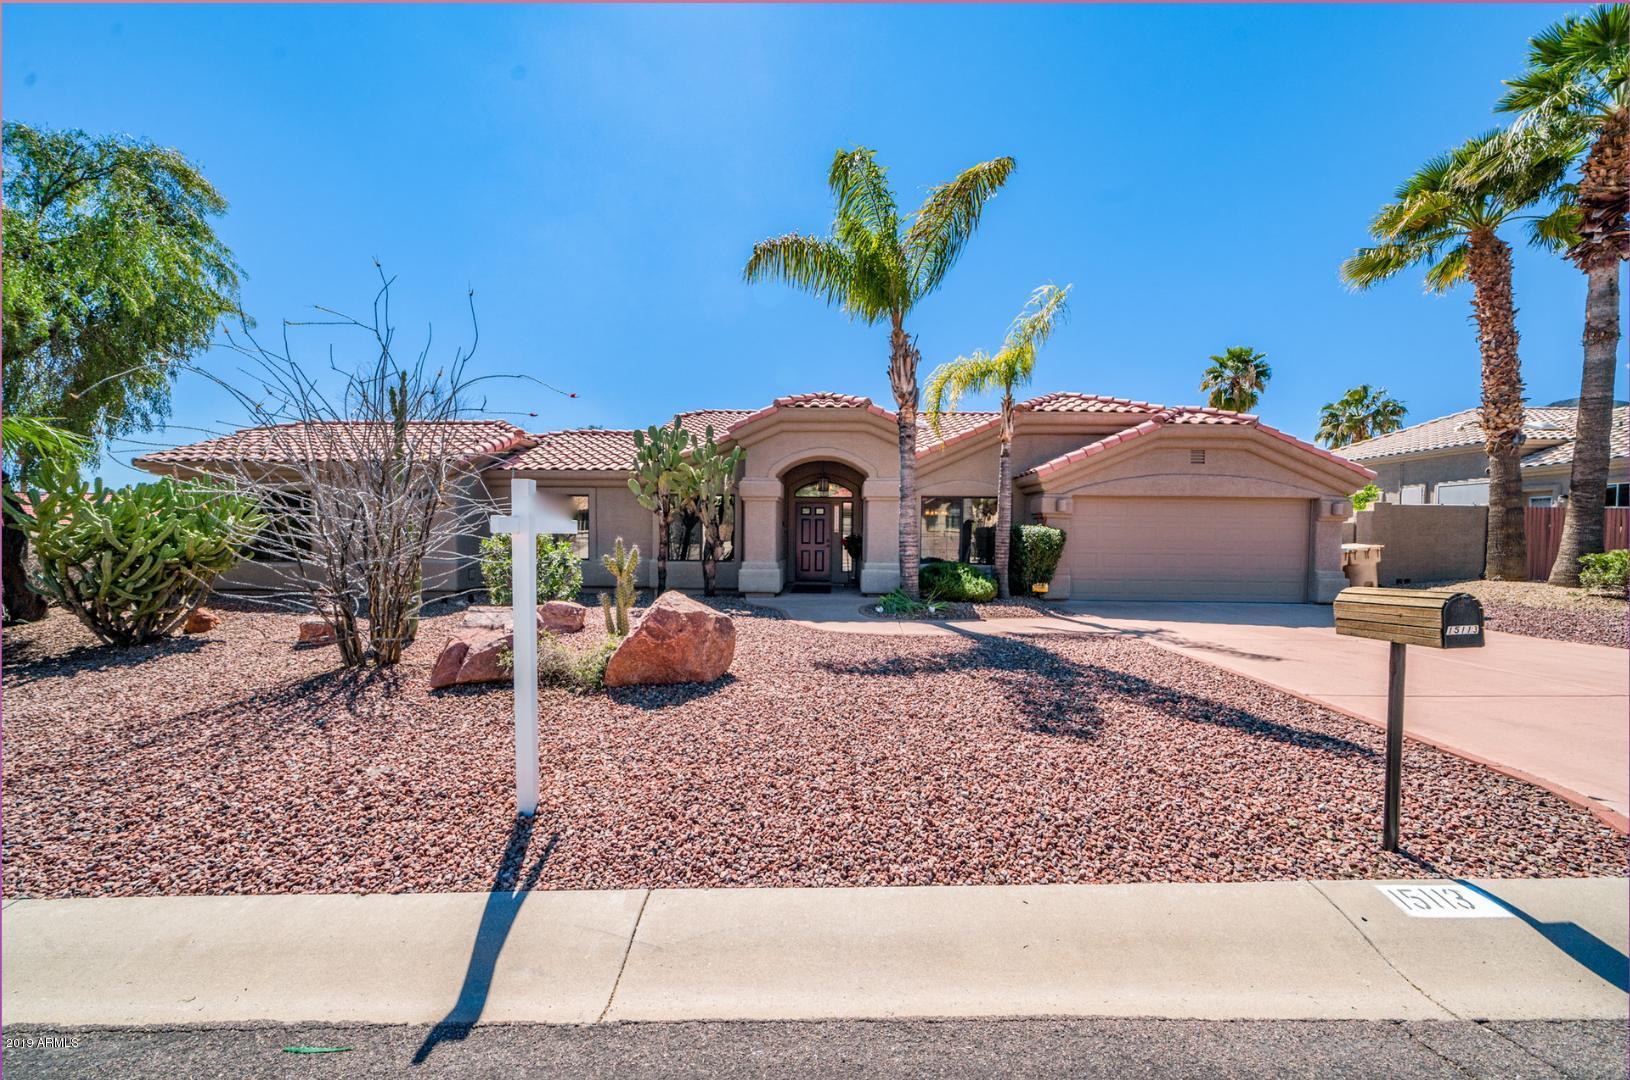 15113 E Greene Valley Road, Fountain Hills, Arizona